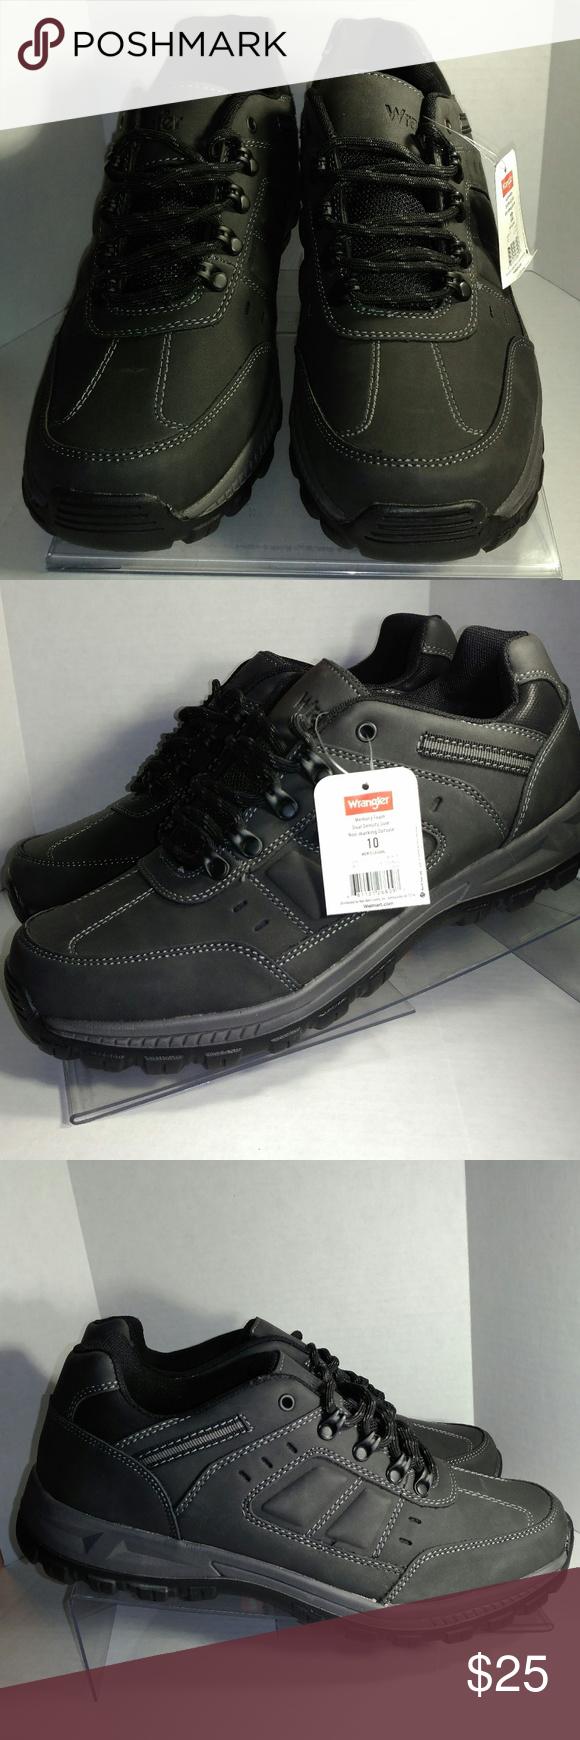 Wrangler Men s Rugged Oxford Black Shoe NWT Wrangler Men s Rugged Oxford  Shoes in Mulitiple Sizes Sizes 5c55cf27f13